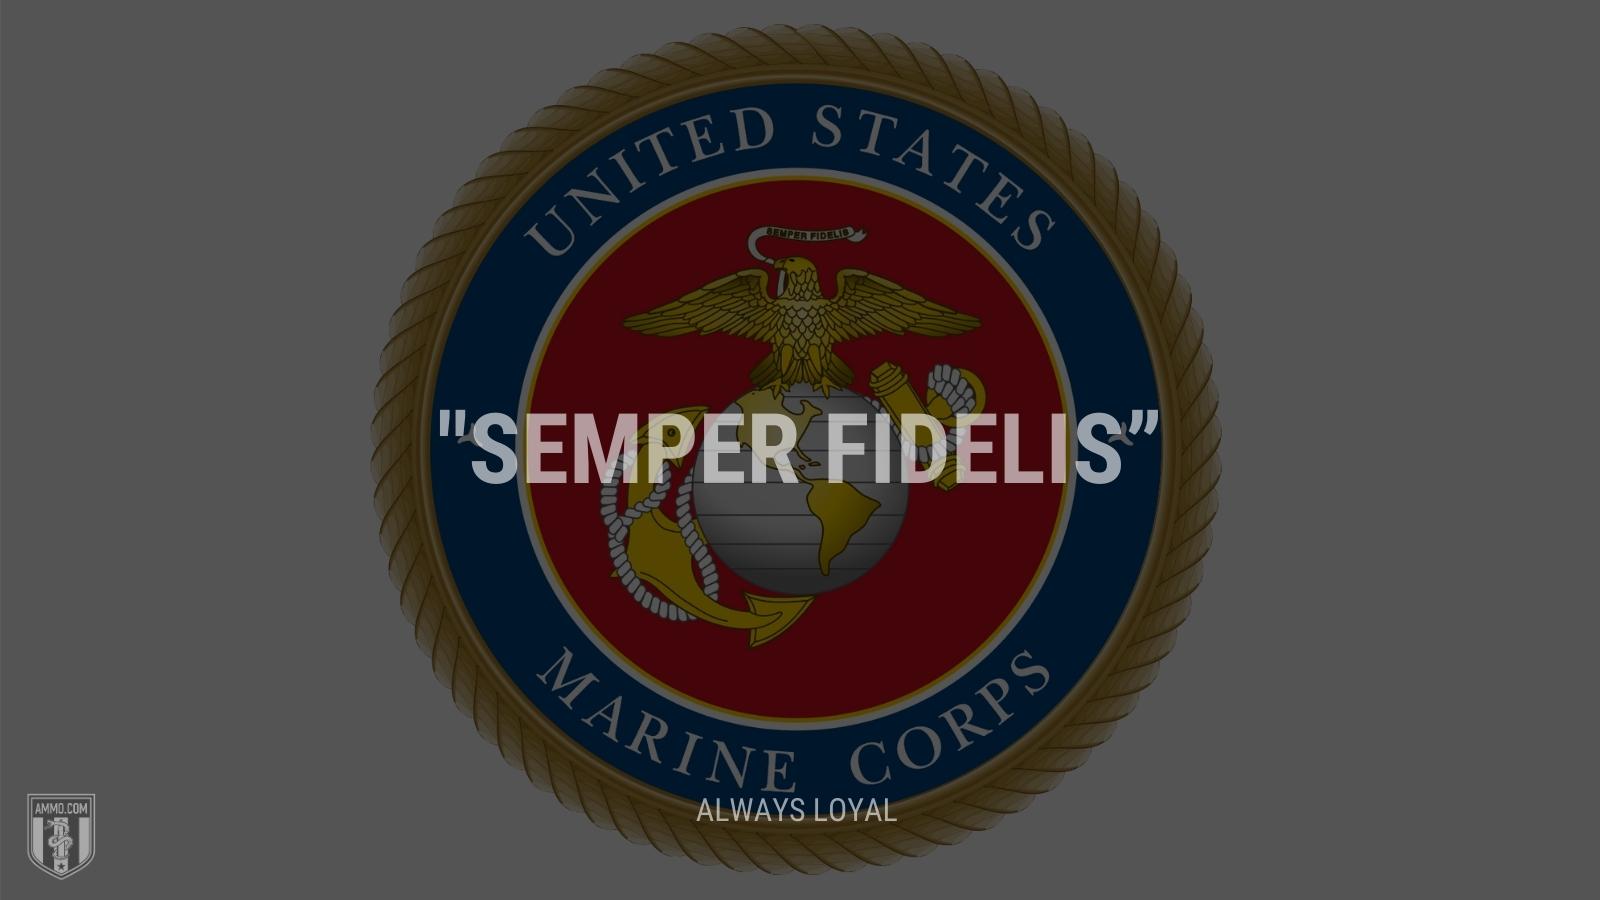 """Semper fidelis"" - Always loyal"